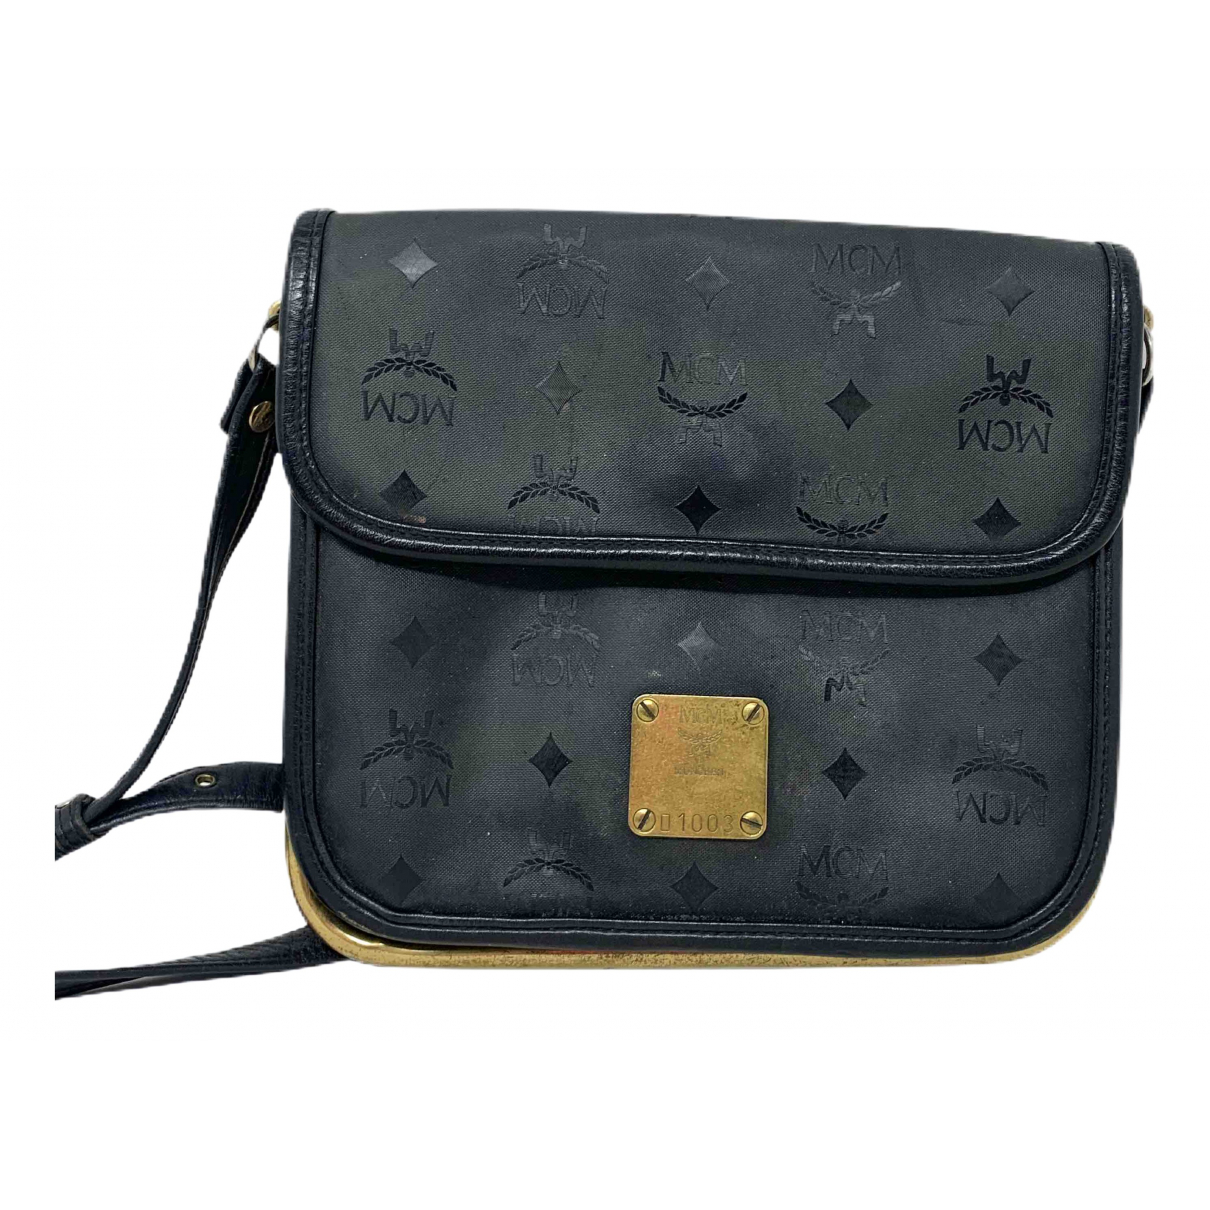 Mcm \N Handtasche in  Schwarz Leder